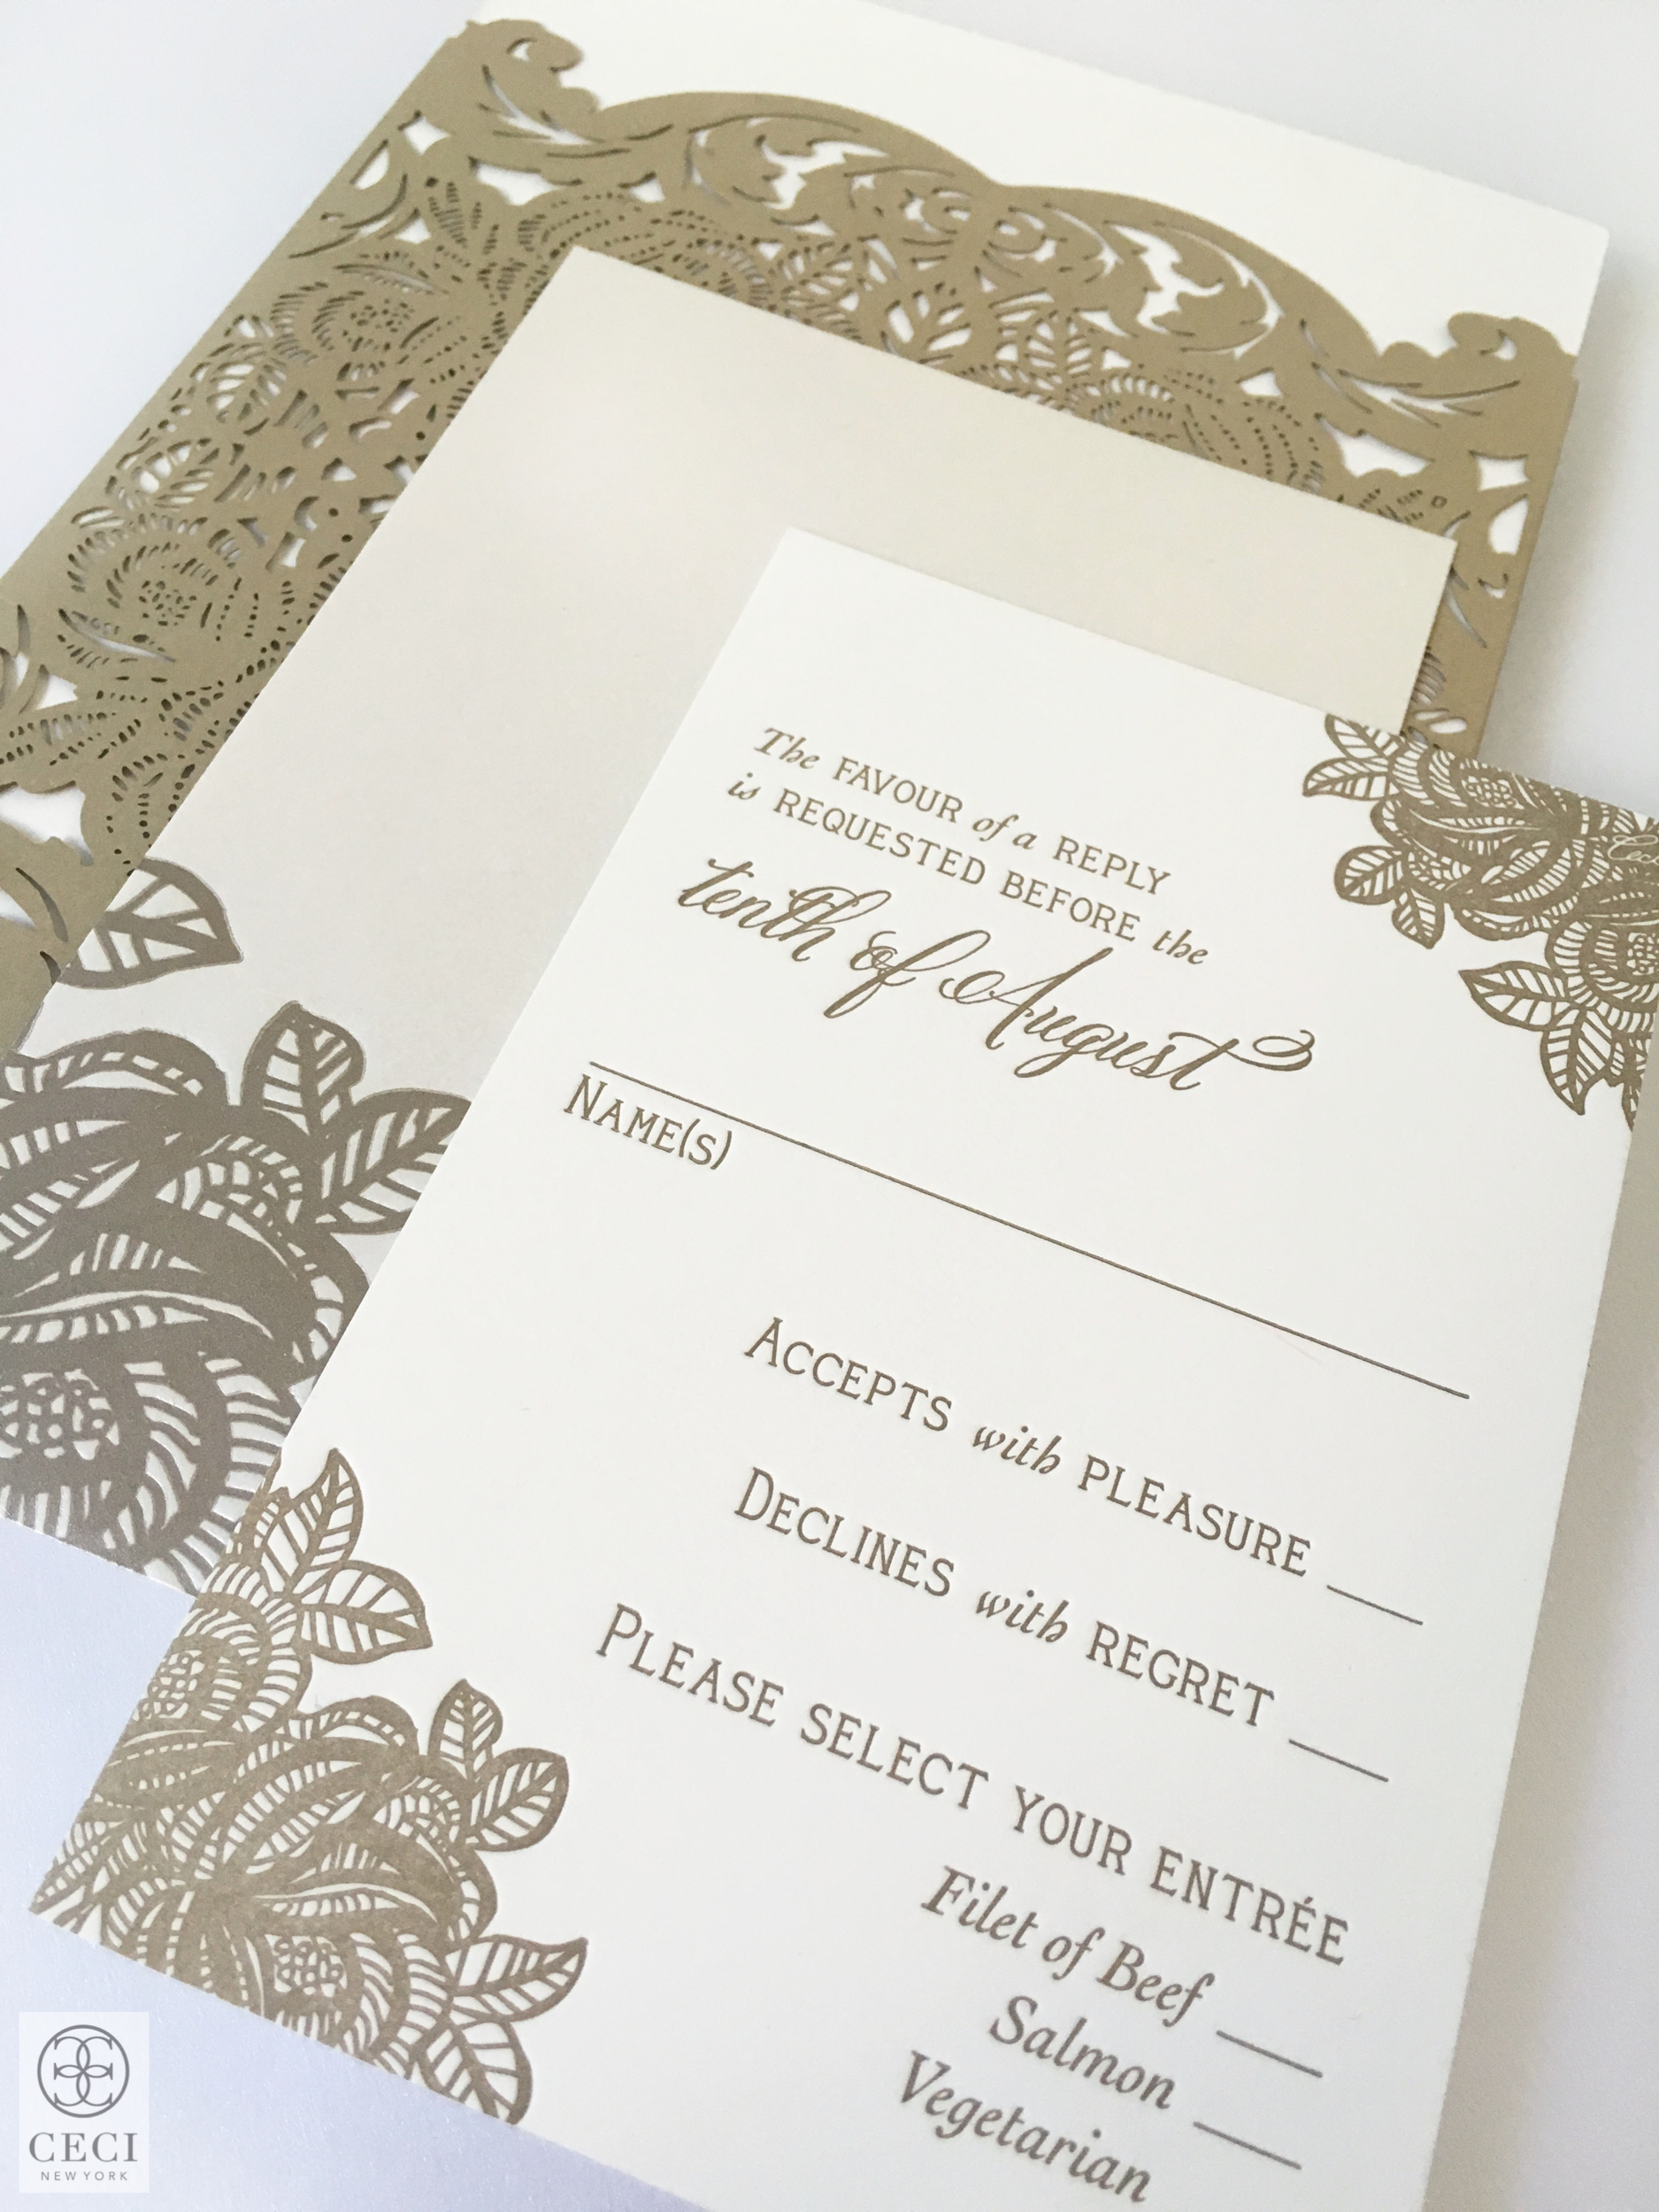 Ceci_New_York_Ceci_Style_Ceci_Johnson_Luxury_Lifestyle_Floral_Lace_Wedding_Letterpress_Inspiration_Design_Custom_Couture_Personalized_Invitations_-14.jpg